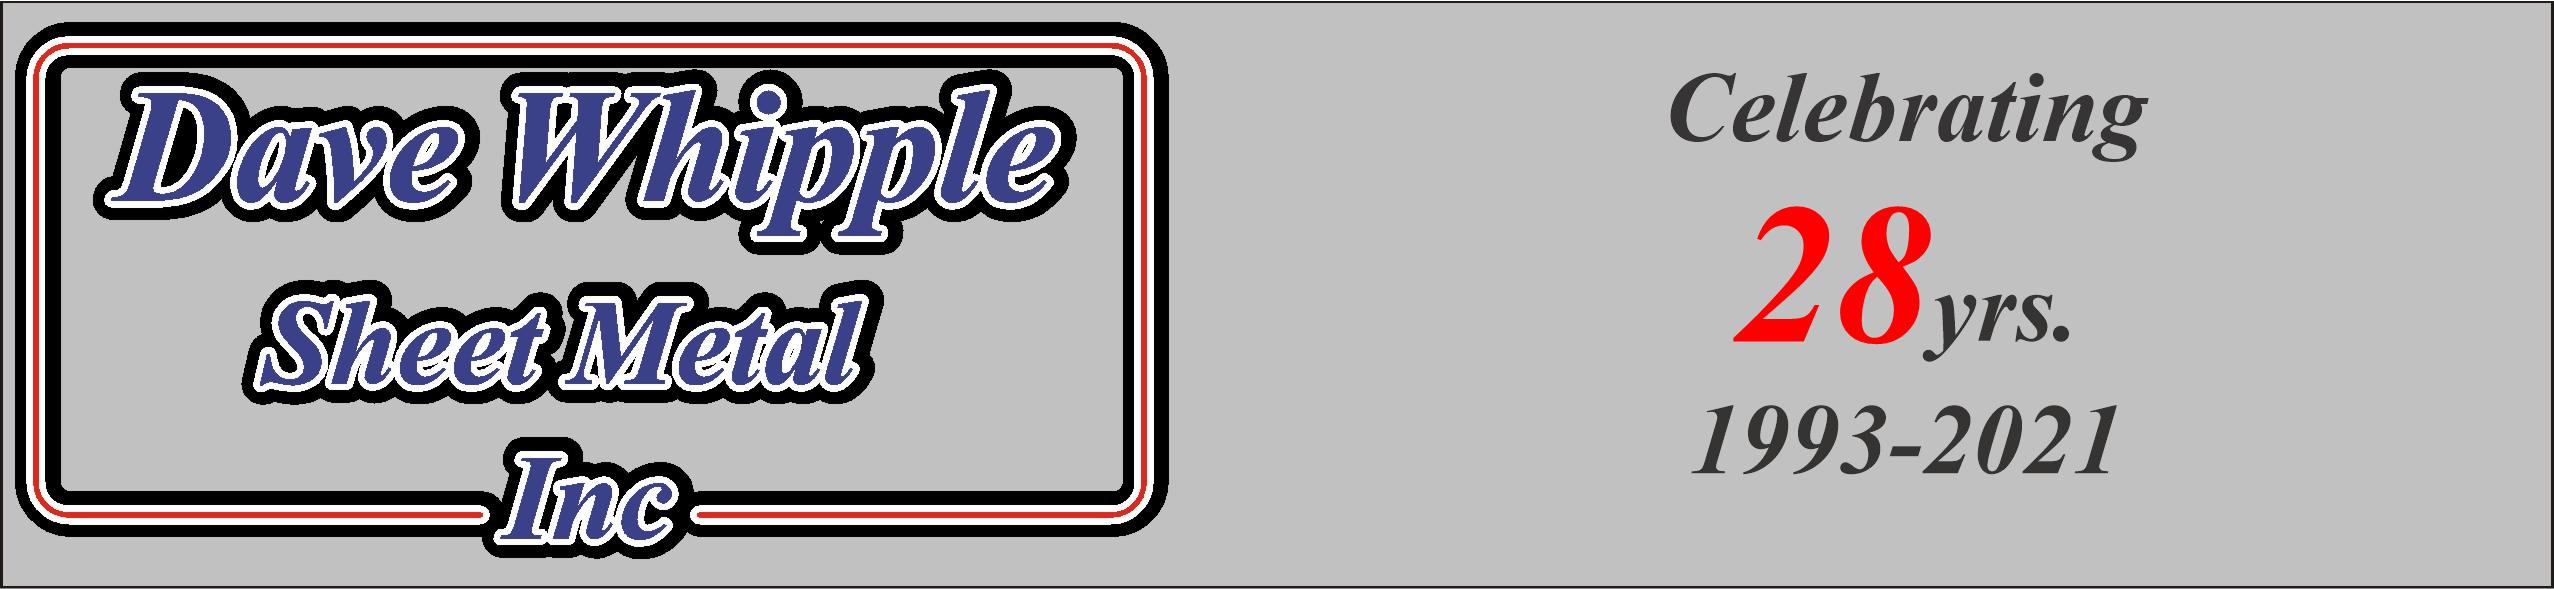 Dave Whipple Sheet Metal, Inc